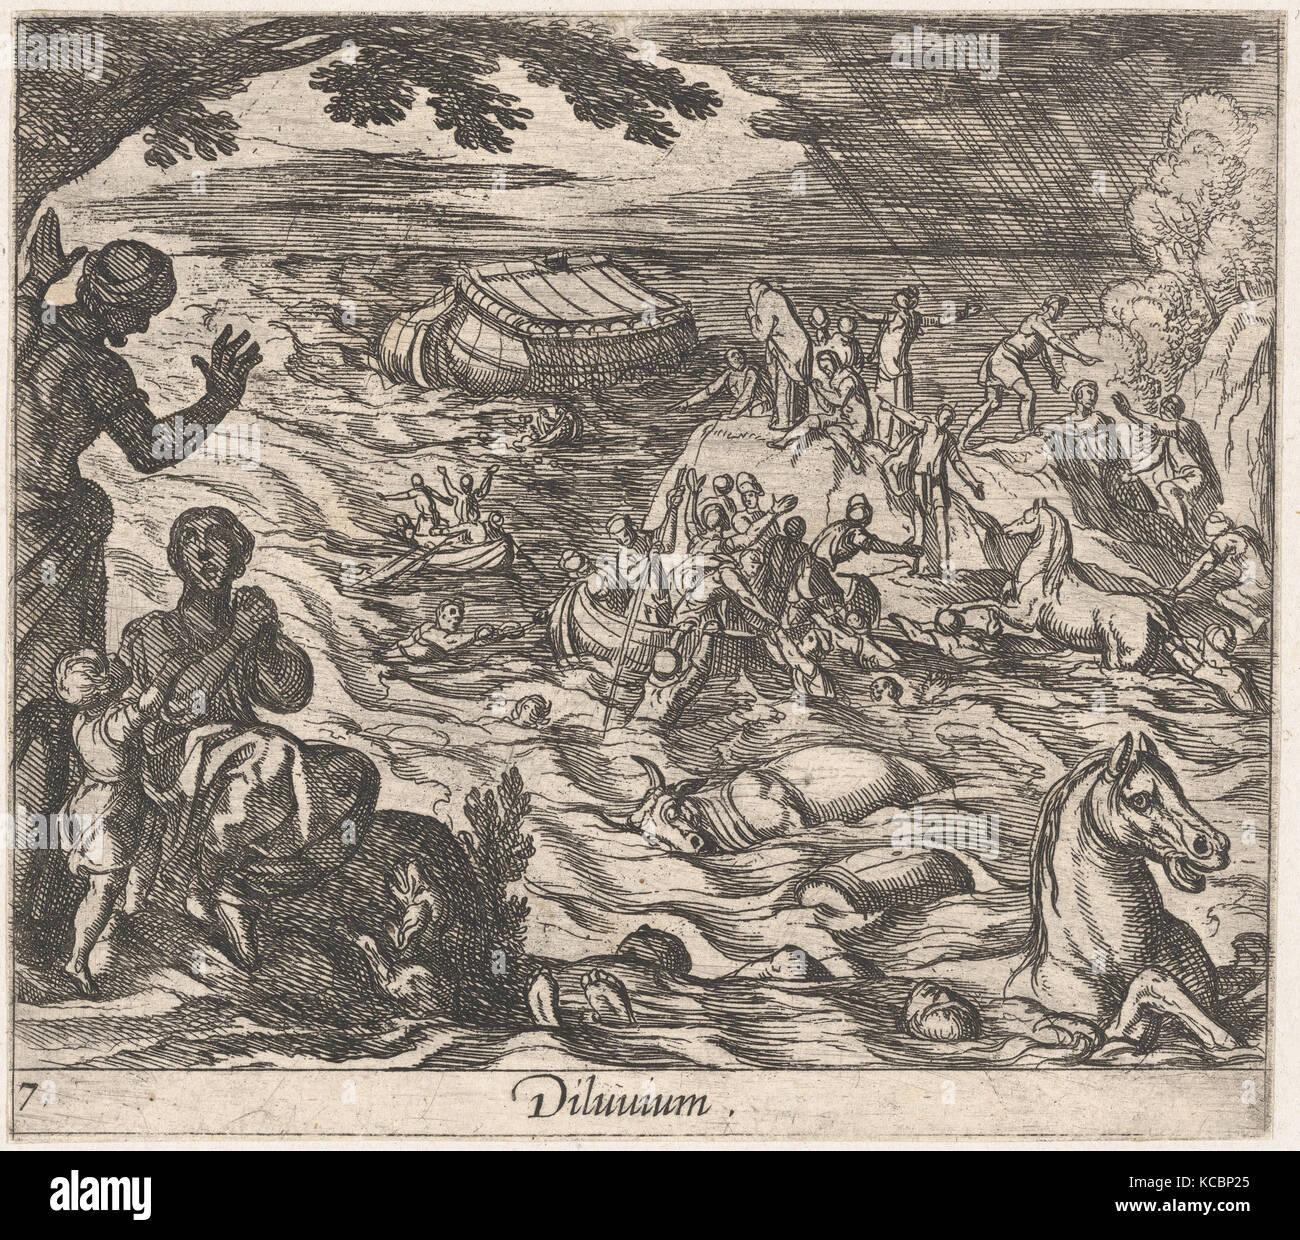 Plate 7: The Flood (Diluvium.), from Ovid's 'Metamorphoses', Antonio Tempesta, 1606 - Stock Image